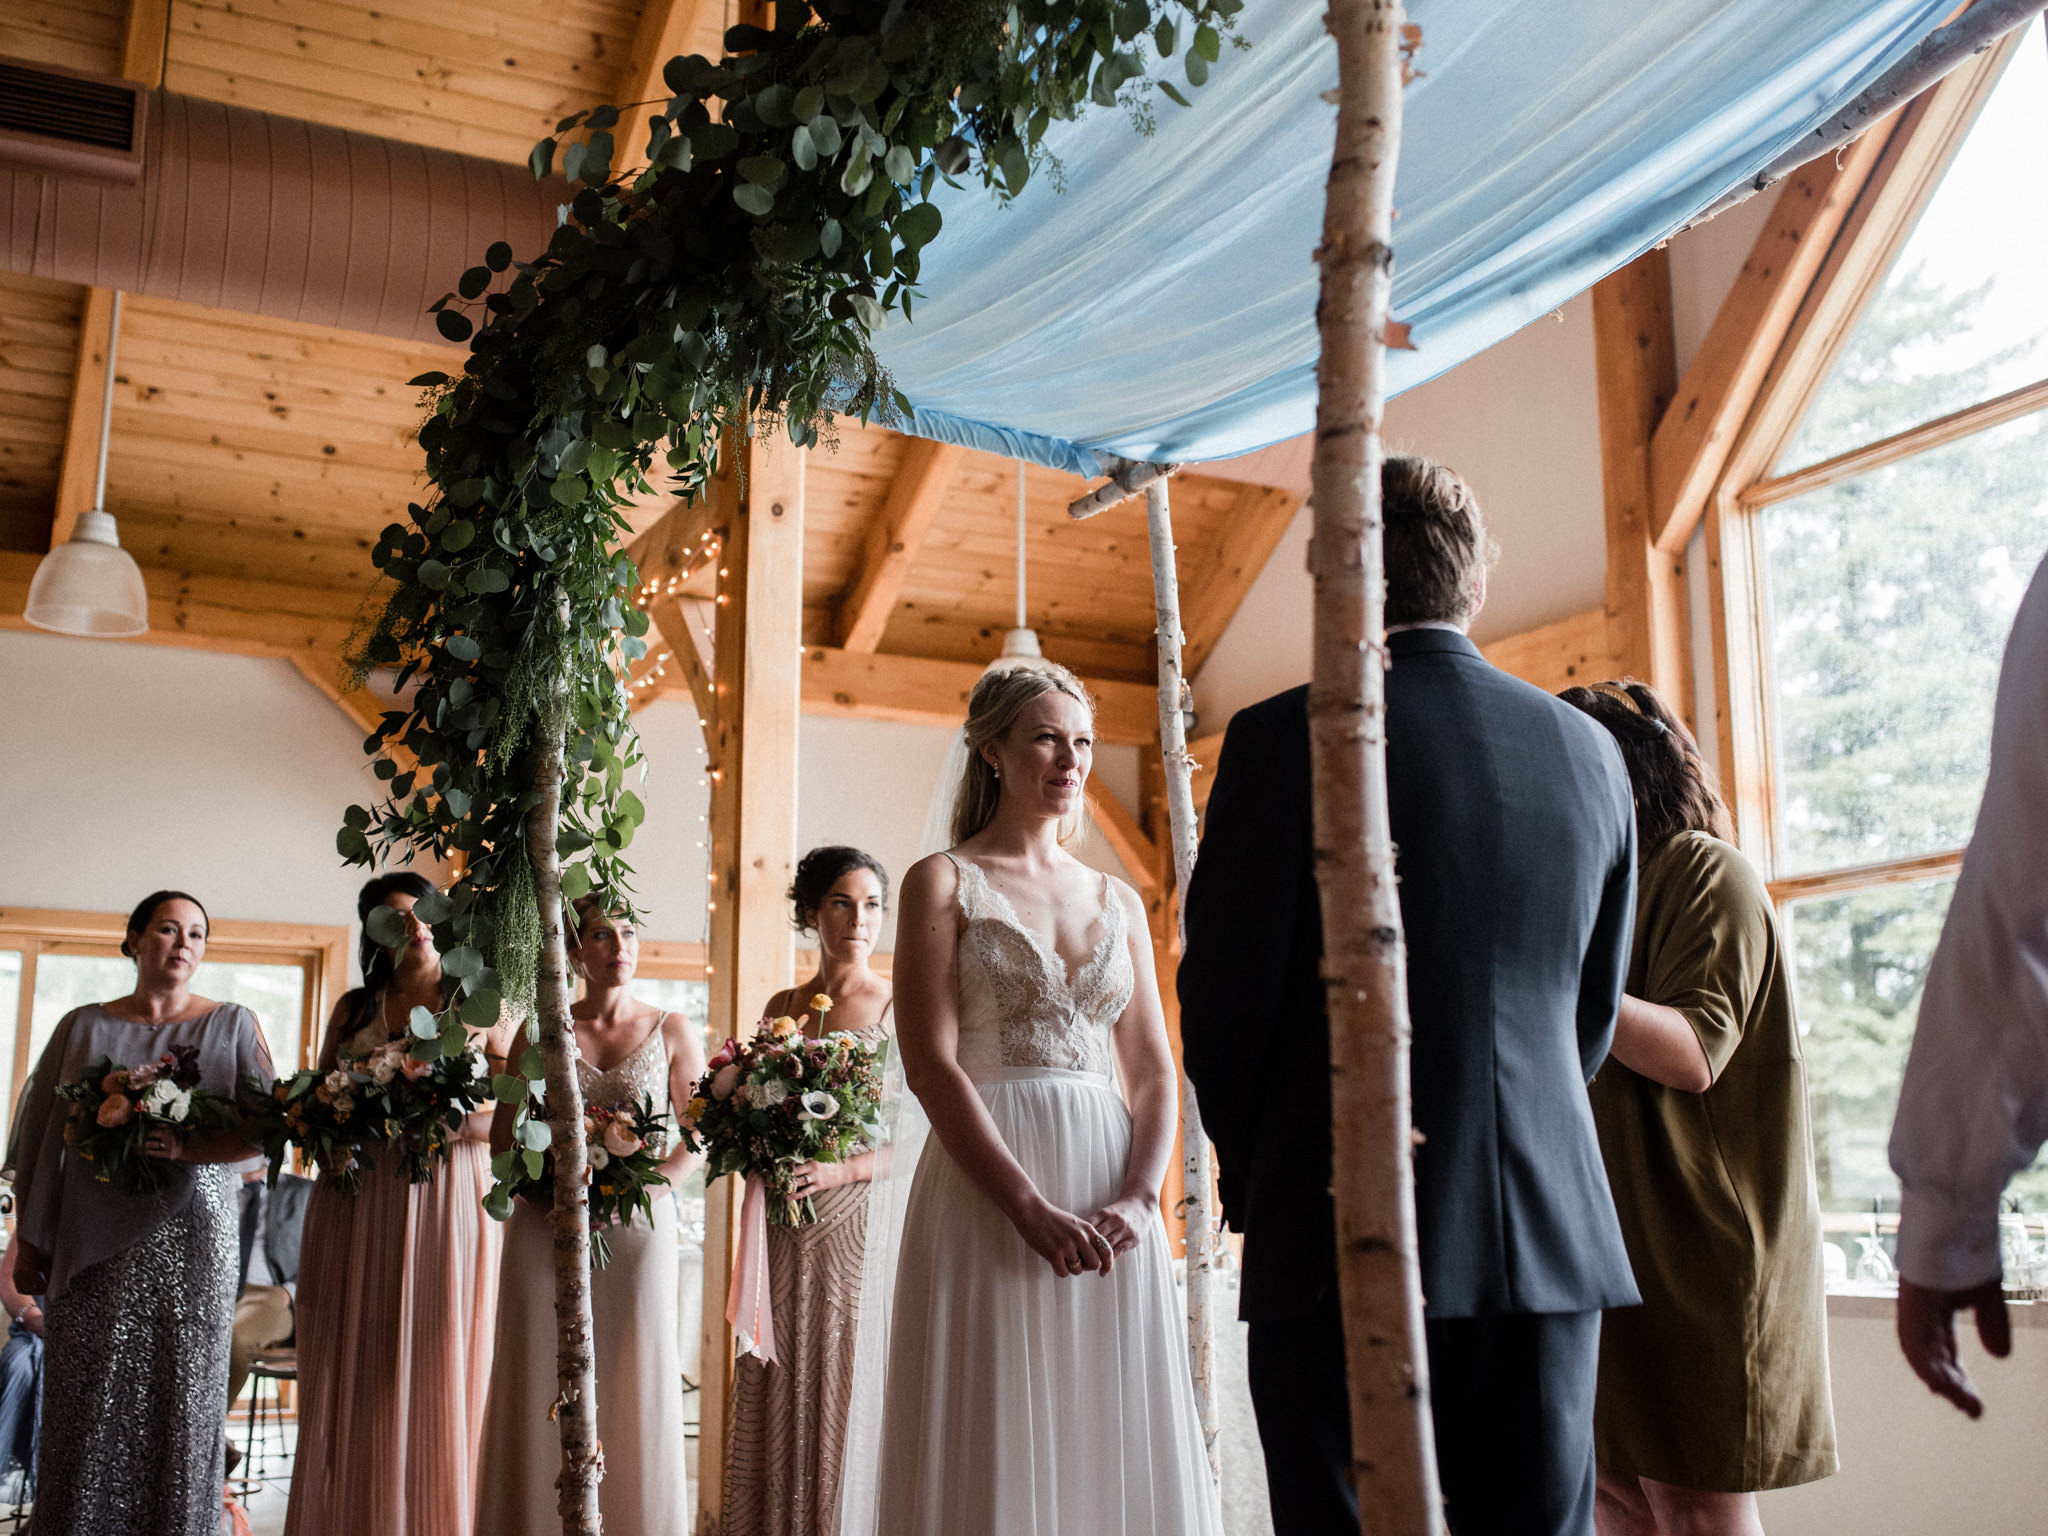 skyloft-wedding-toronto-wedding-photographer-36.jpg